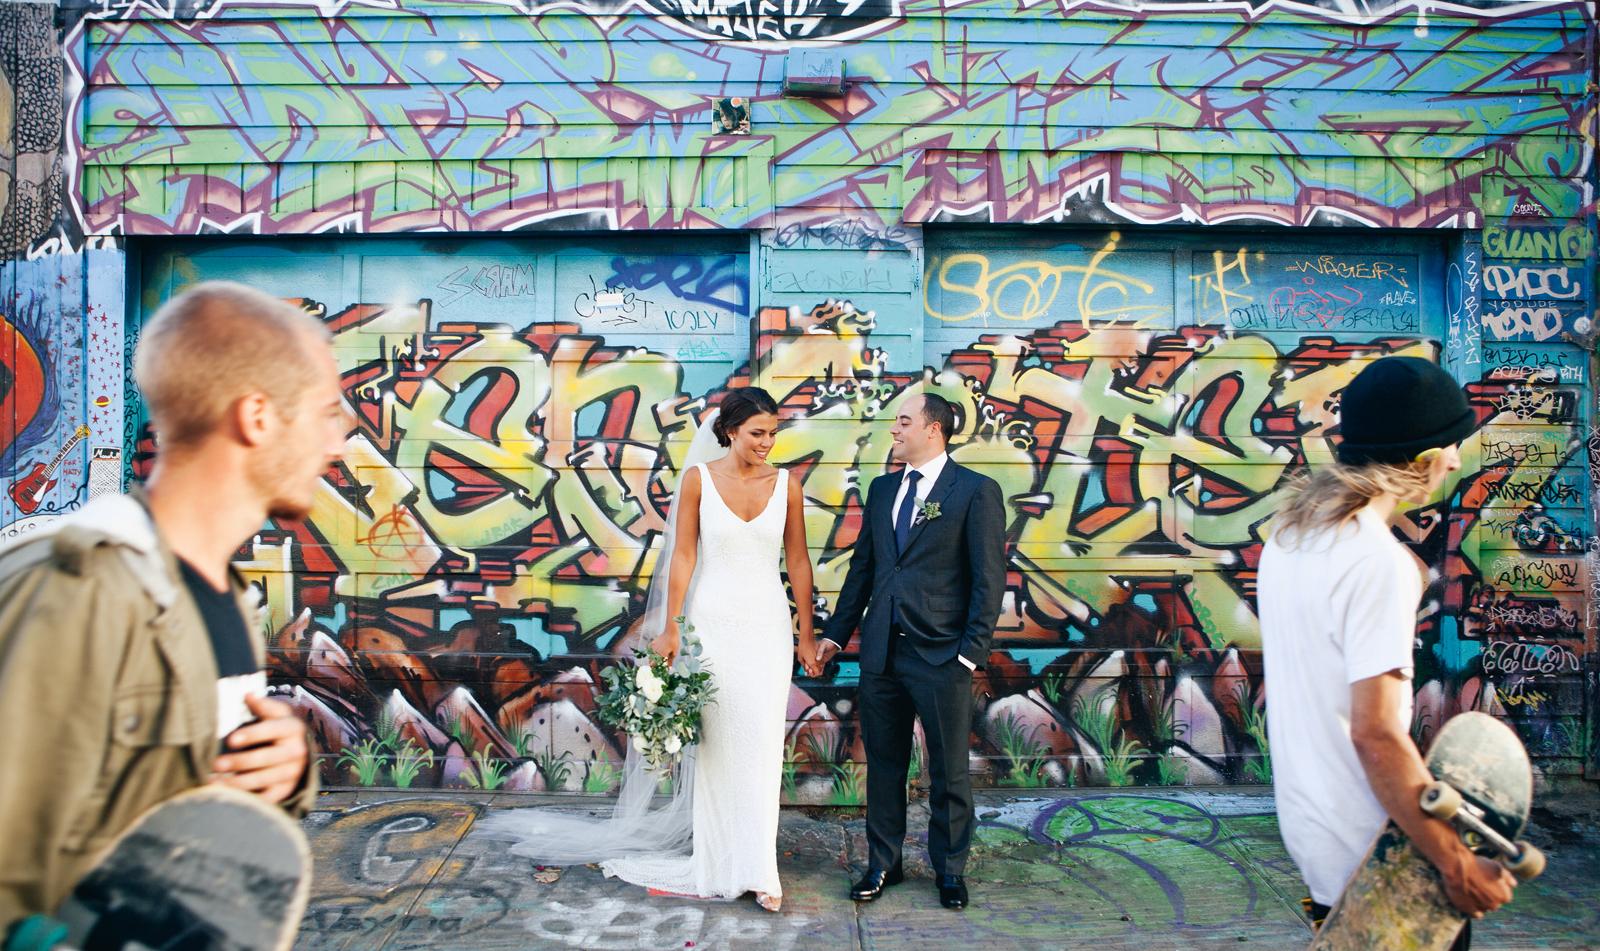 temple_emmanuel_jewish_wedding_san_francisco_ca_sarah_andrew_ebony_siovhan_bokeh_photography_64.jpg